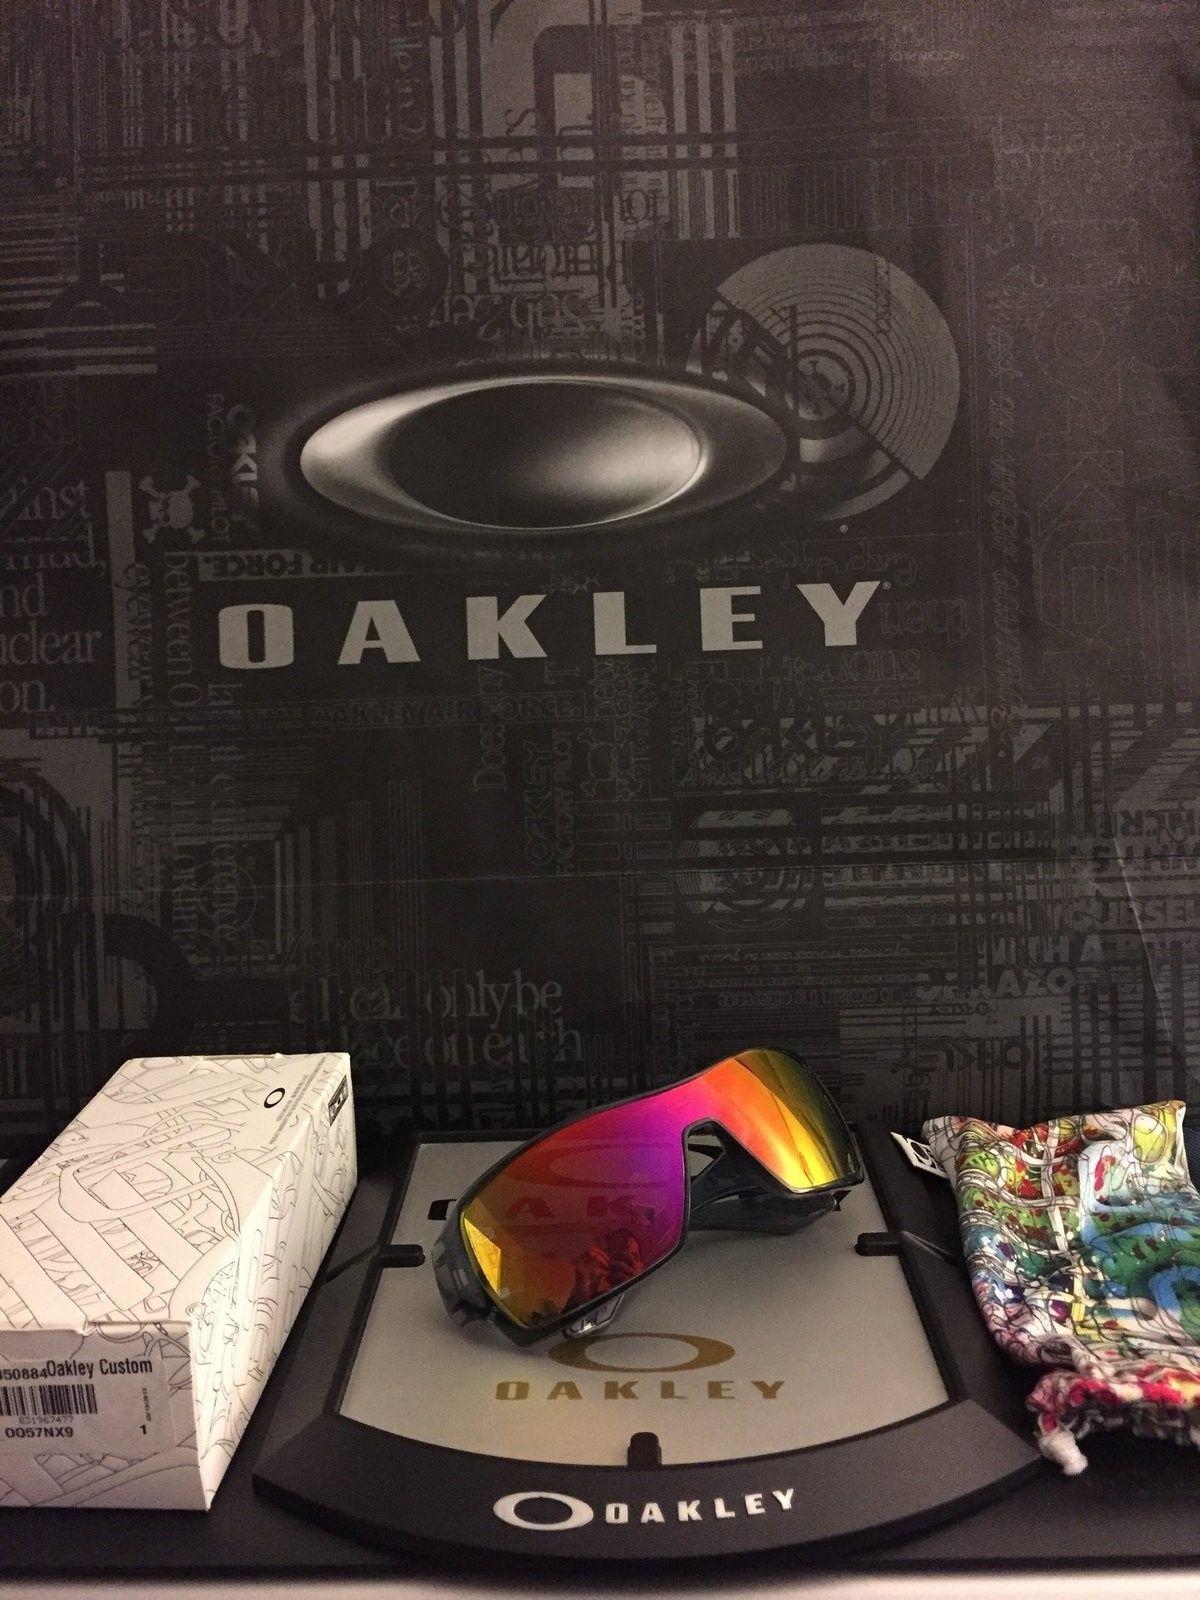 Oakley offshoot polarized ruby iridium - IMG_1645.JPG